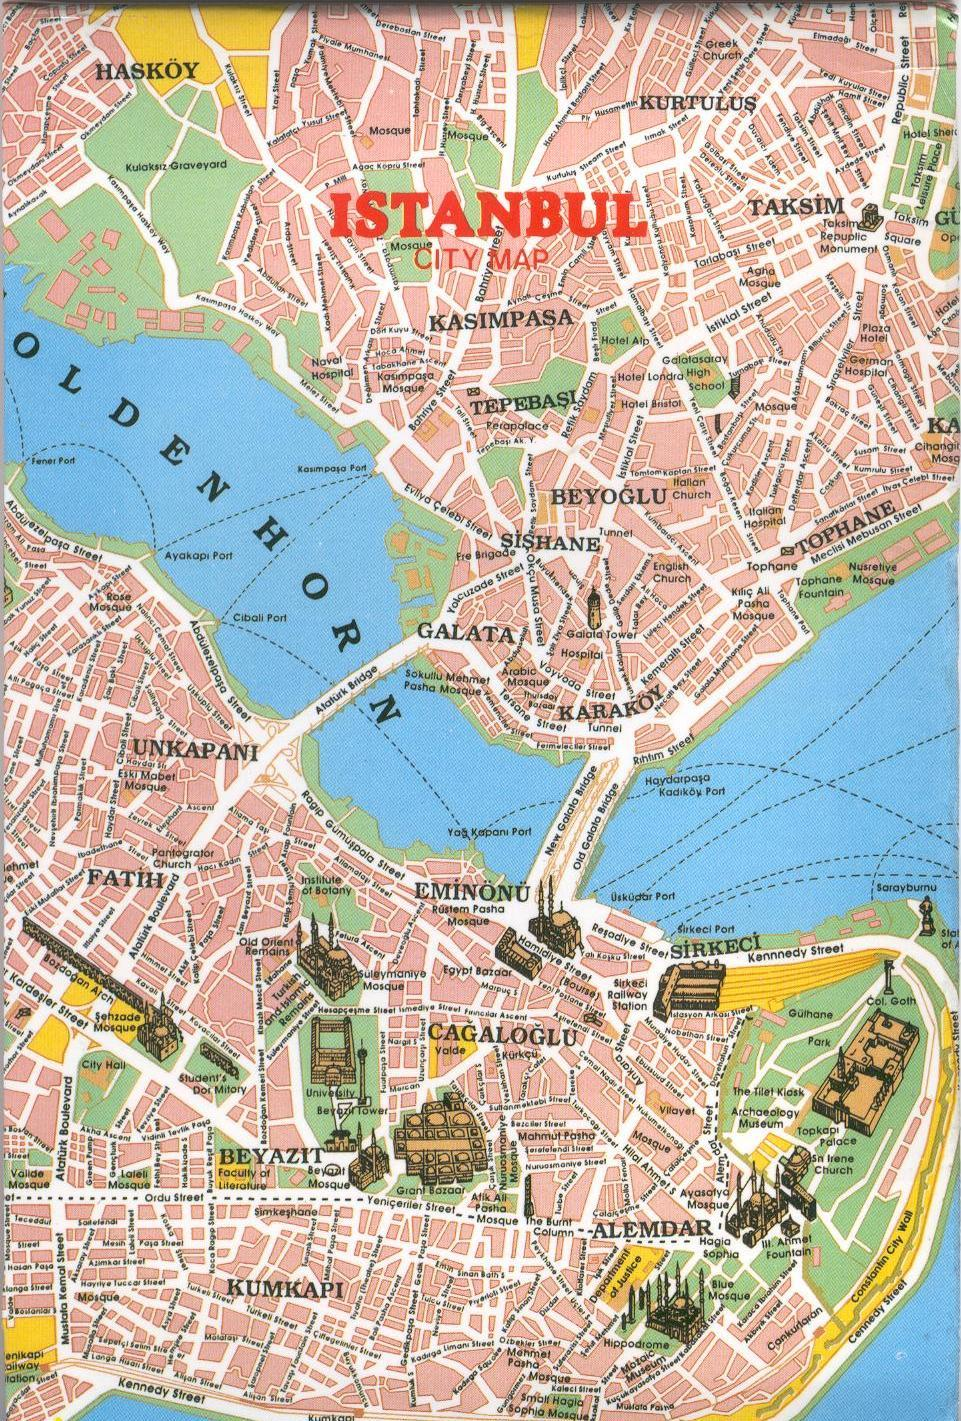 Mapa Monumentos Istambul, Turquia 10